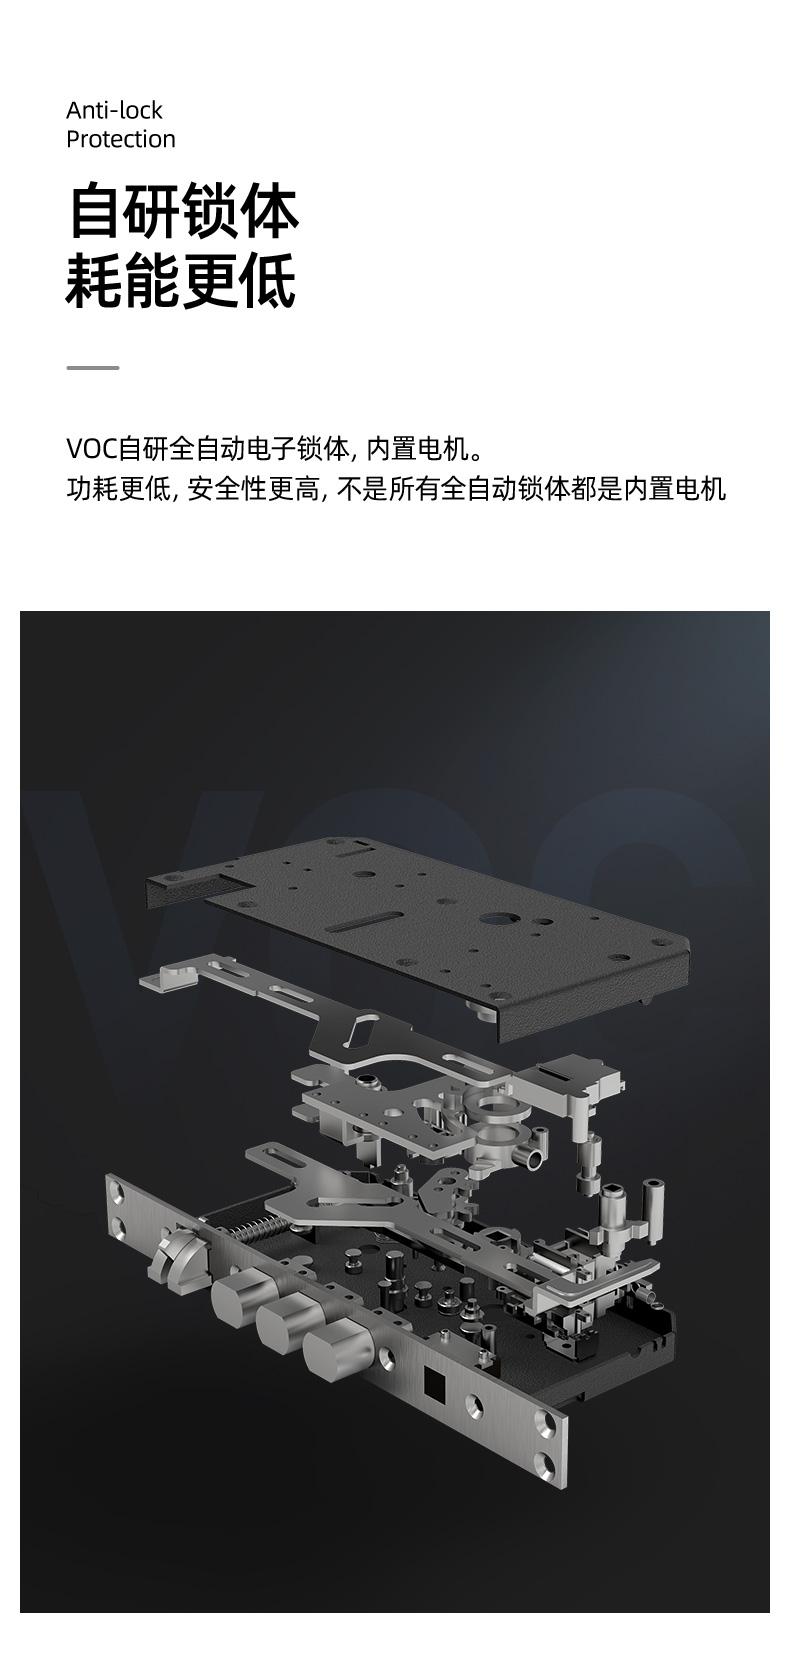 T8详情-黑色-涂鸦-门铃_13.jpg